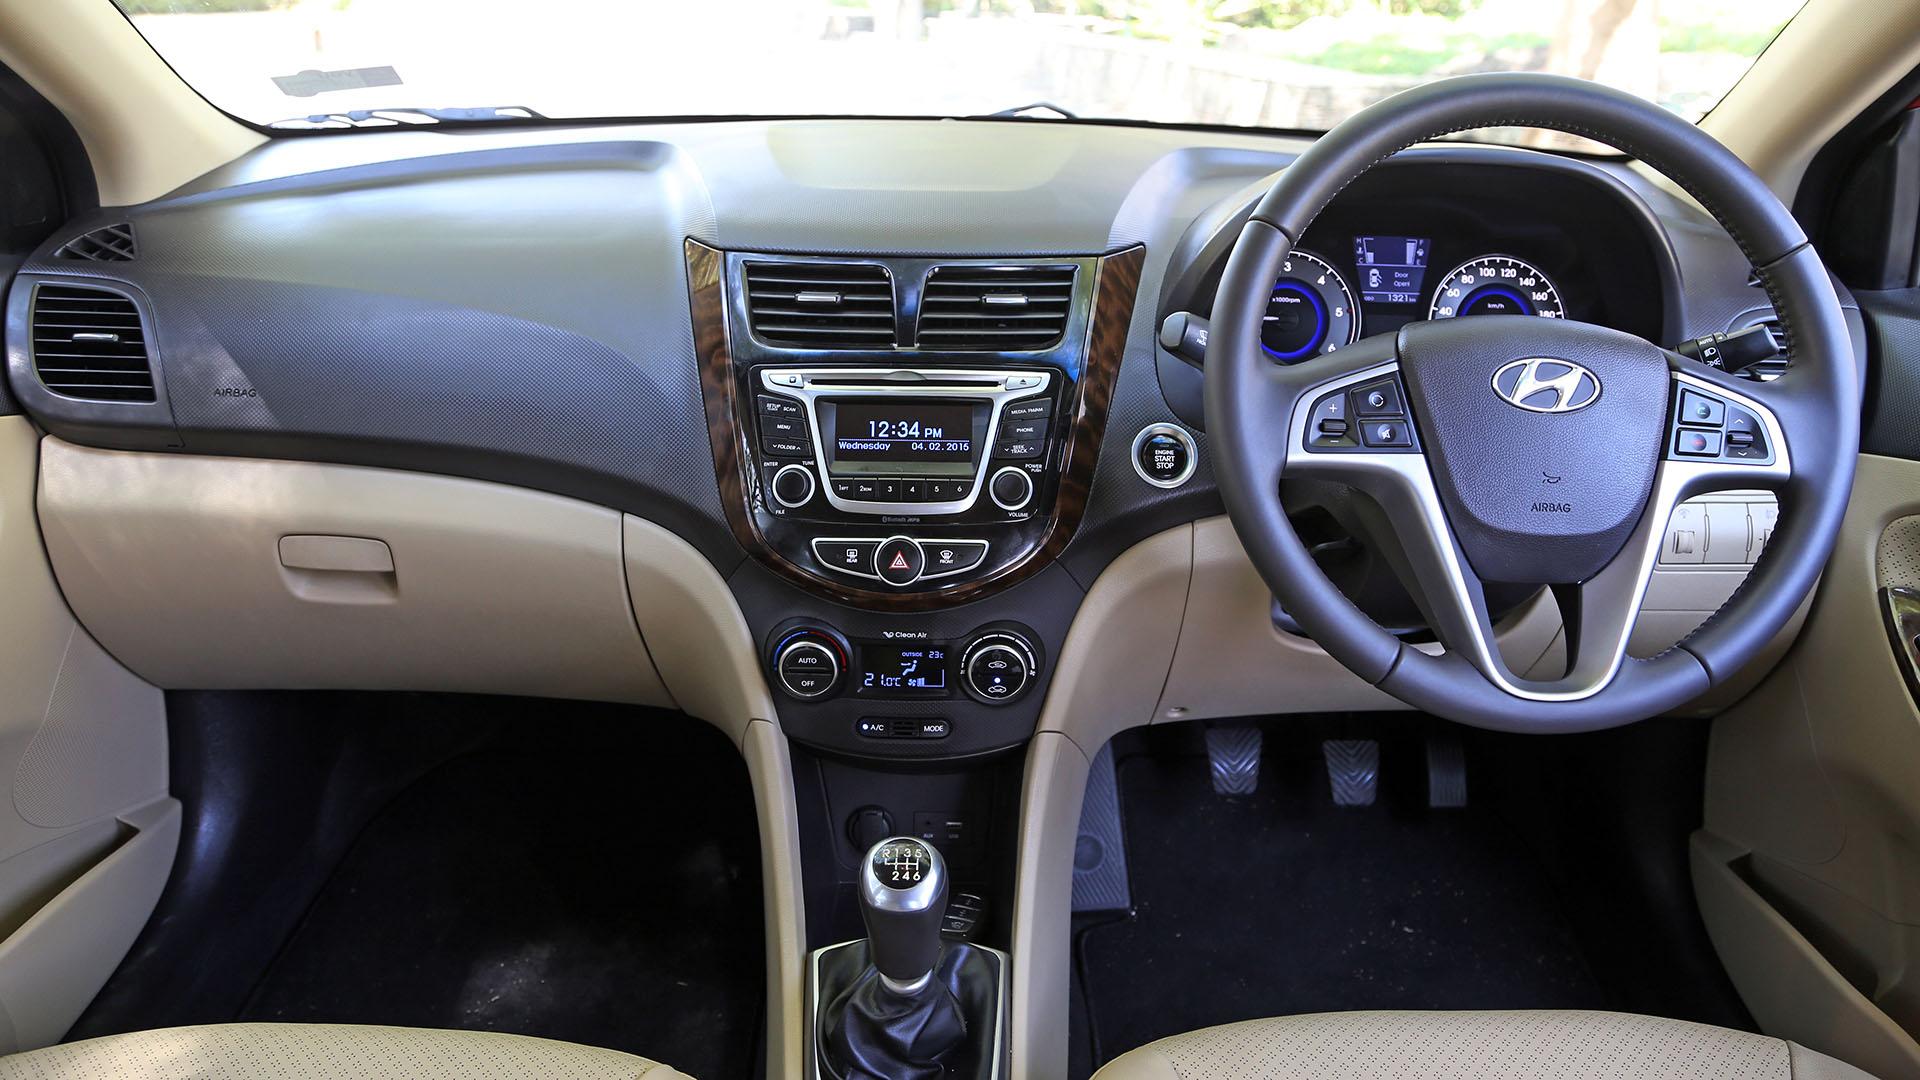 Hyundai 4S Fluidic Verna 2015 16 SX Diesel